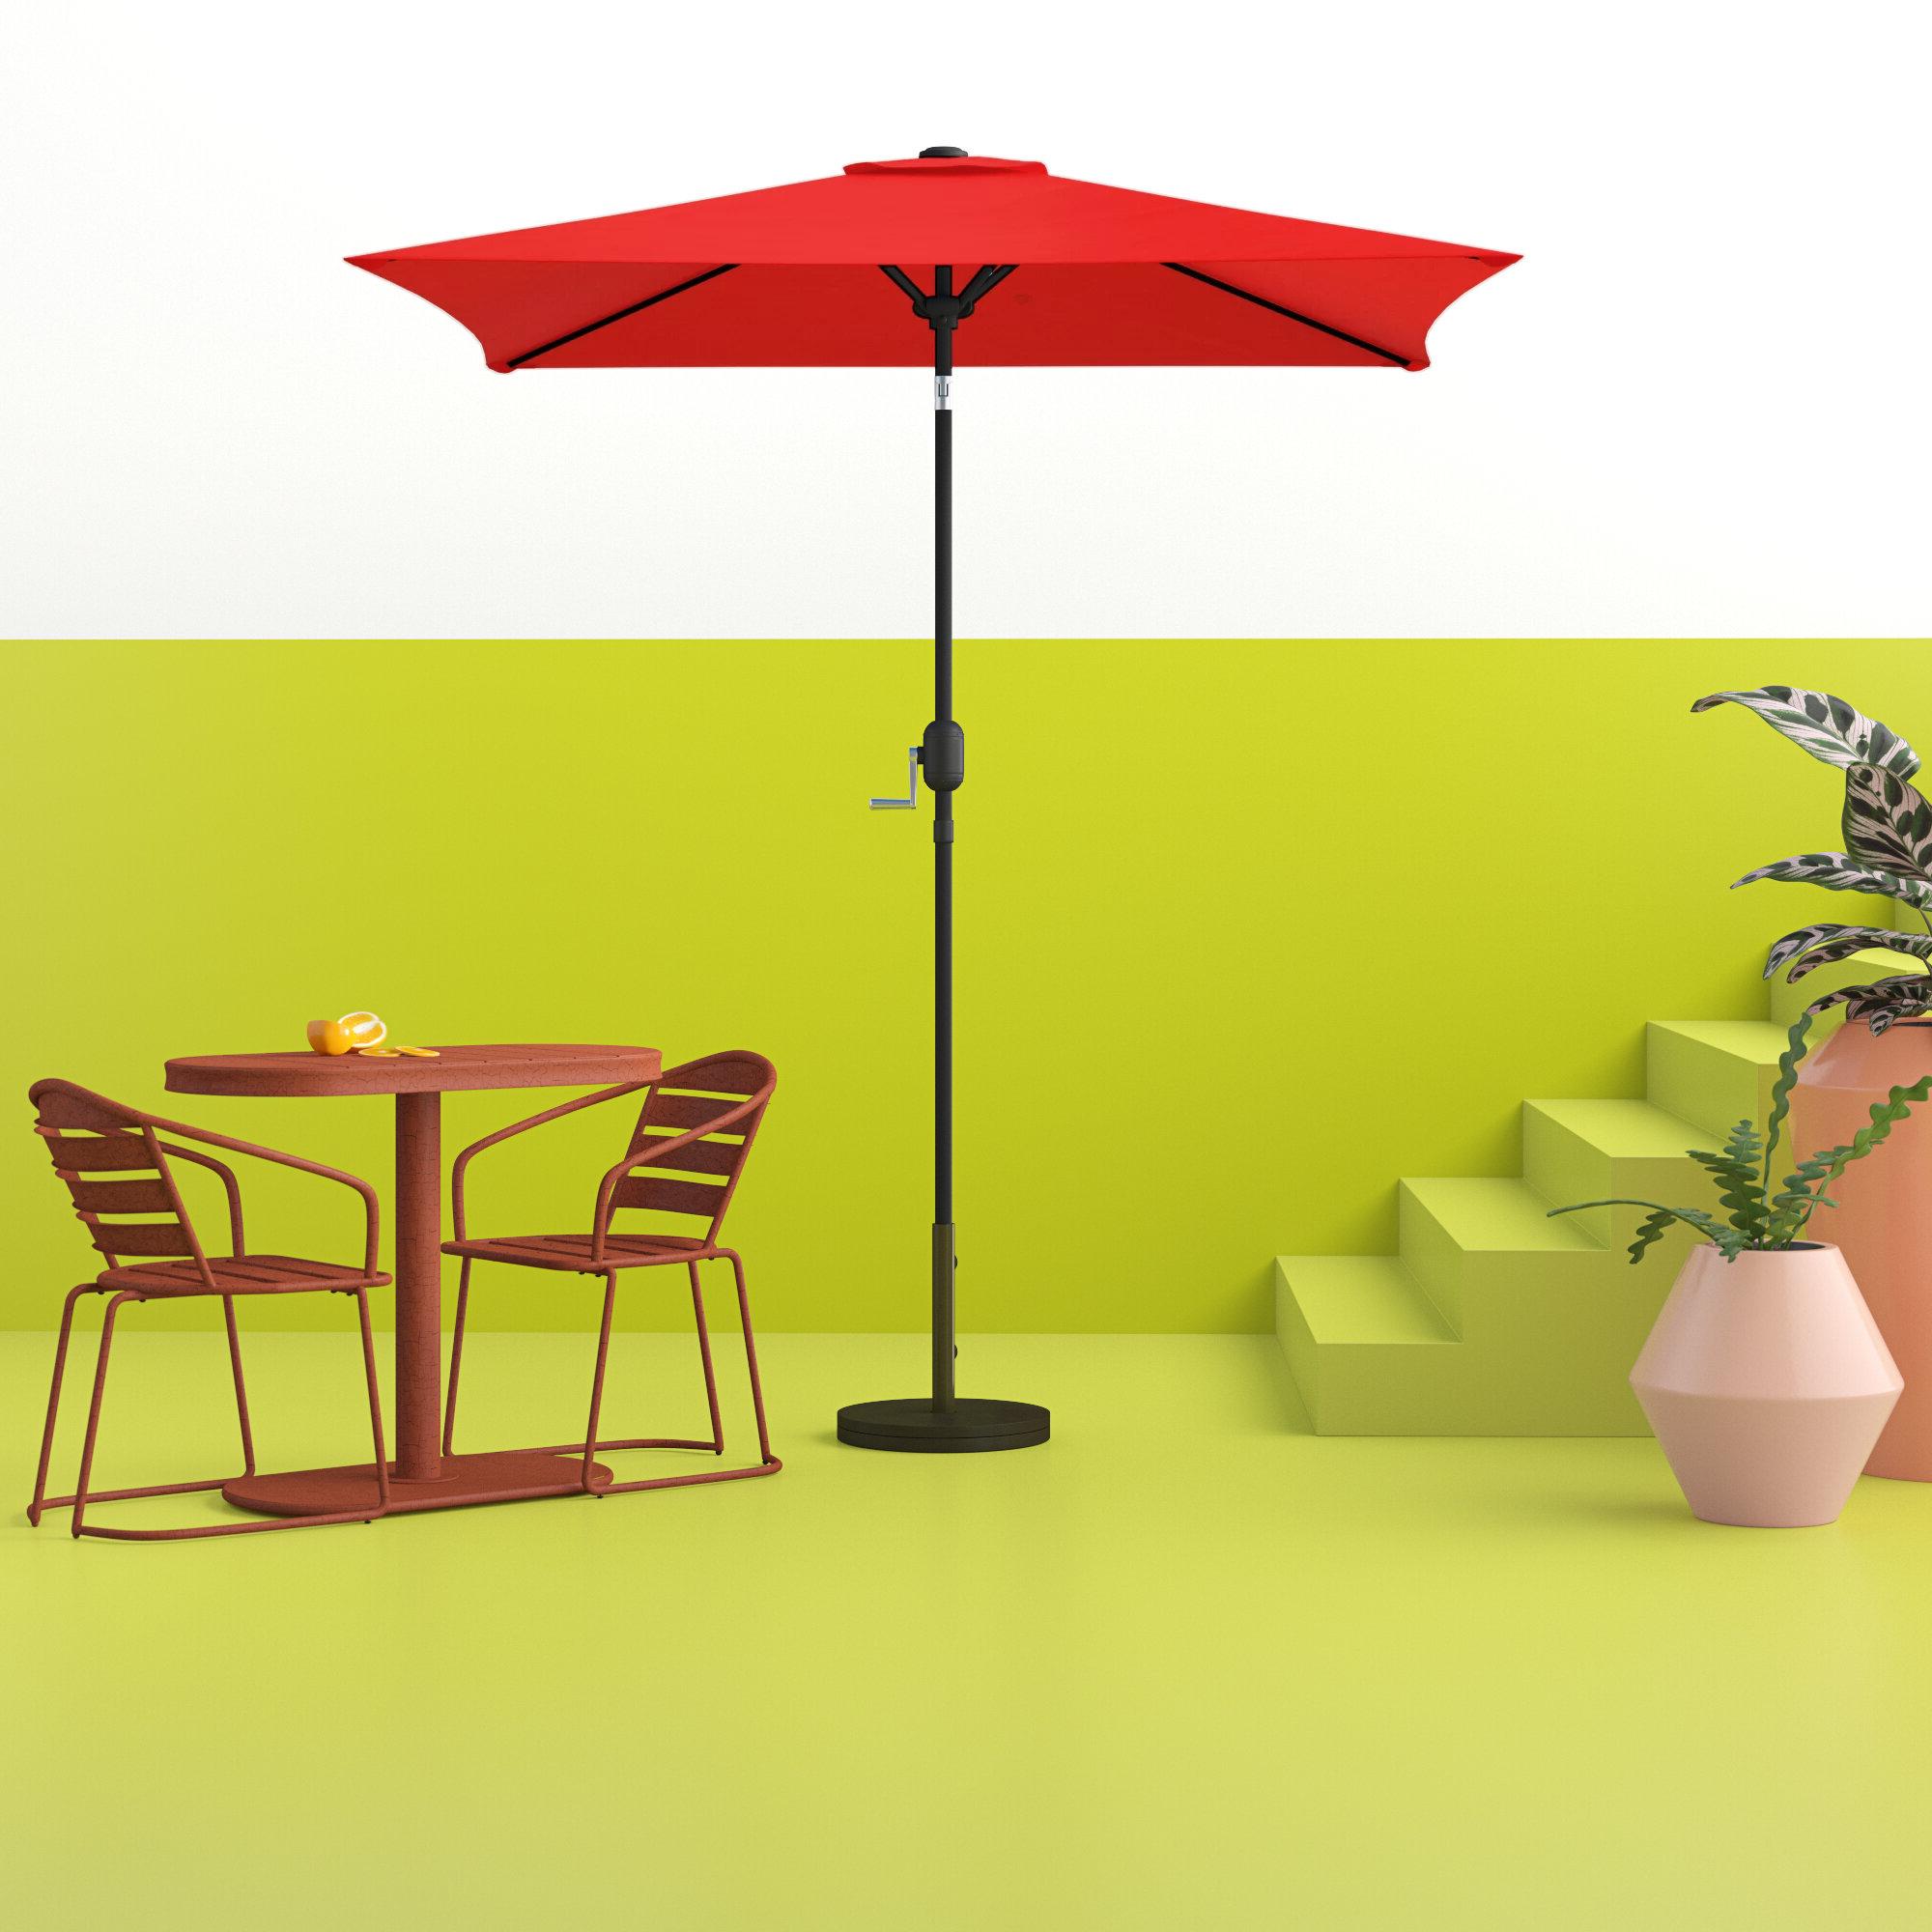 Monty Market Umbrellas With Popular Bradford Patio 6.5' Square Market Umbrella (Gallery 4 of 20)